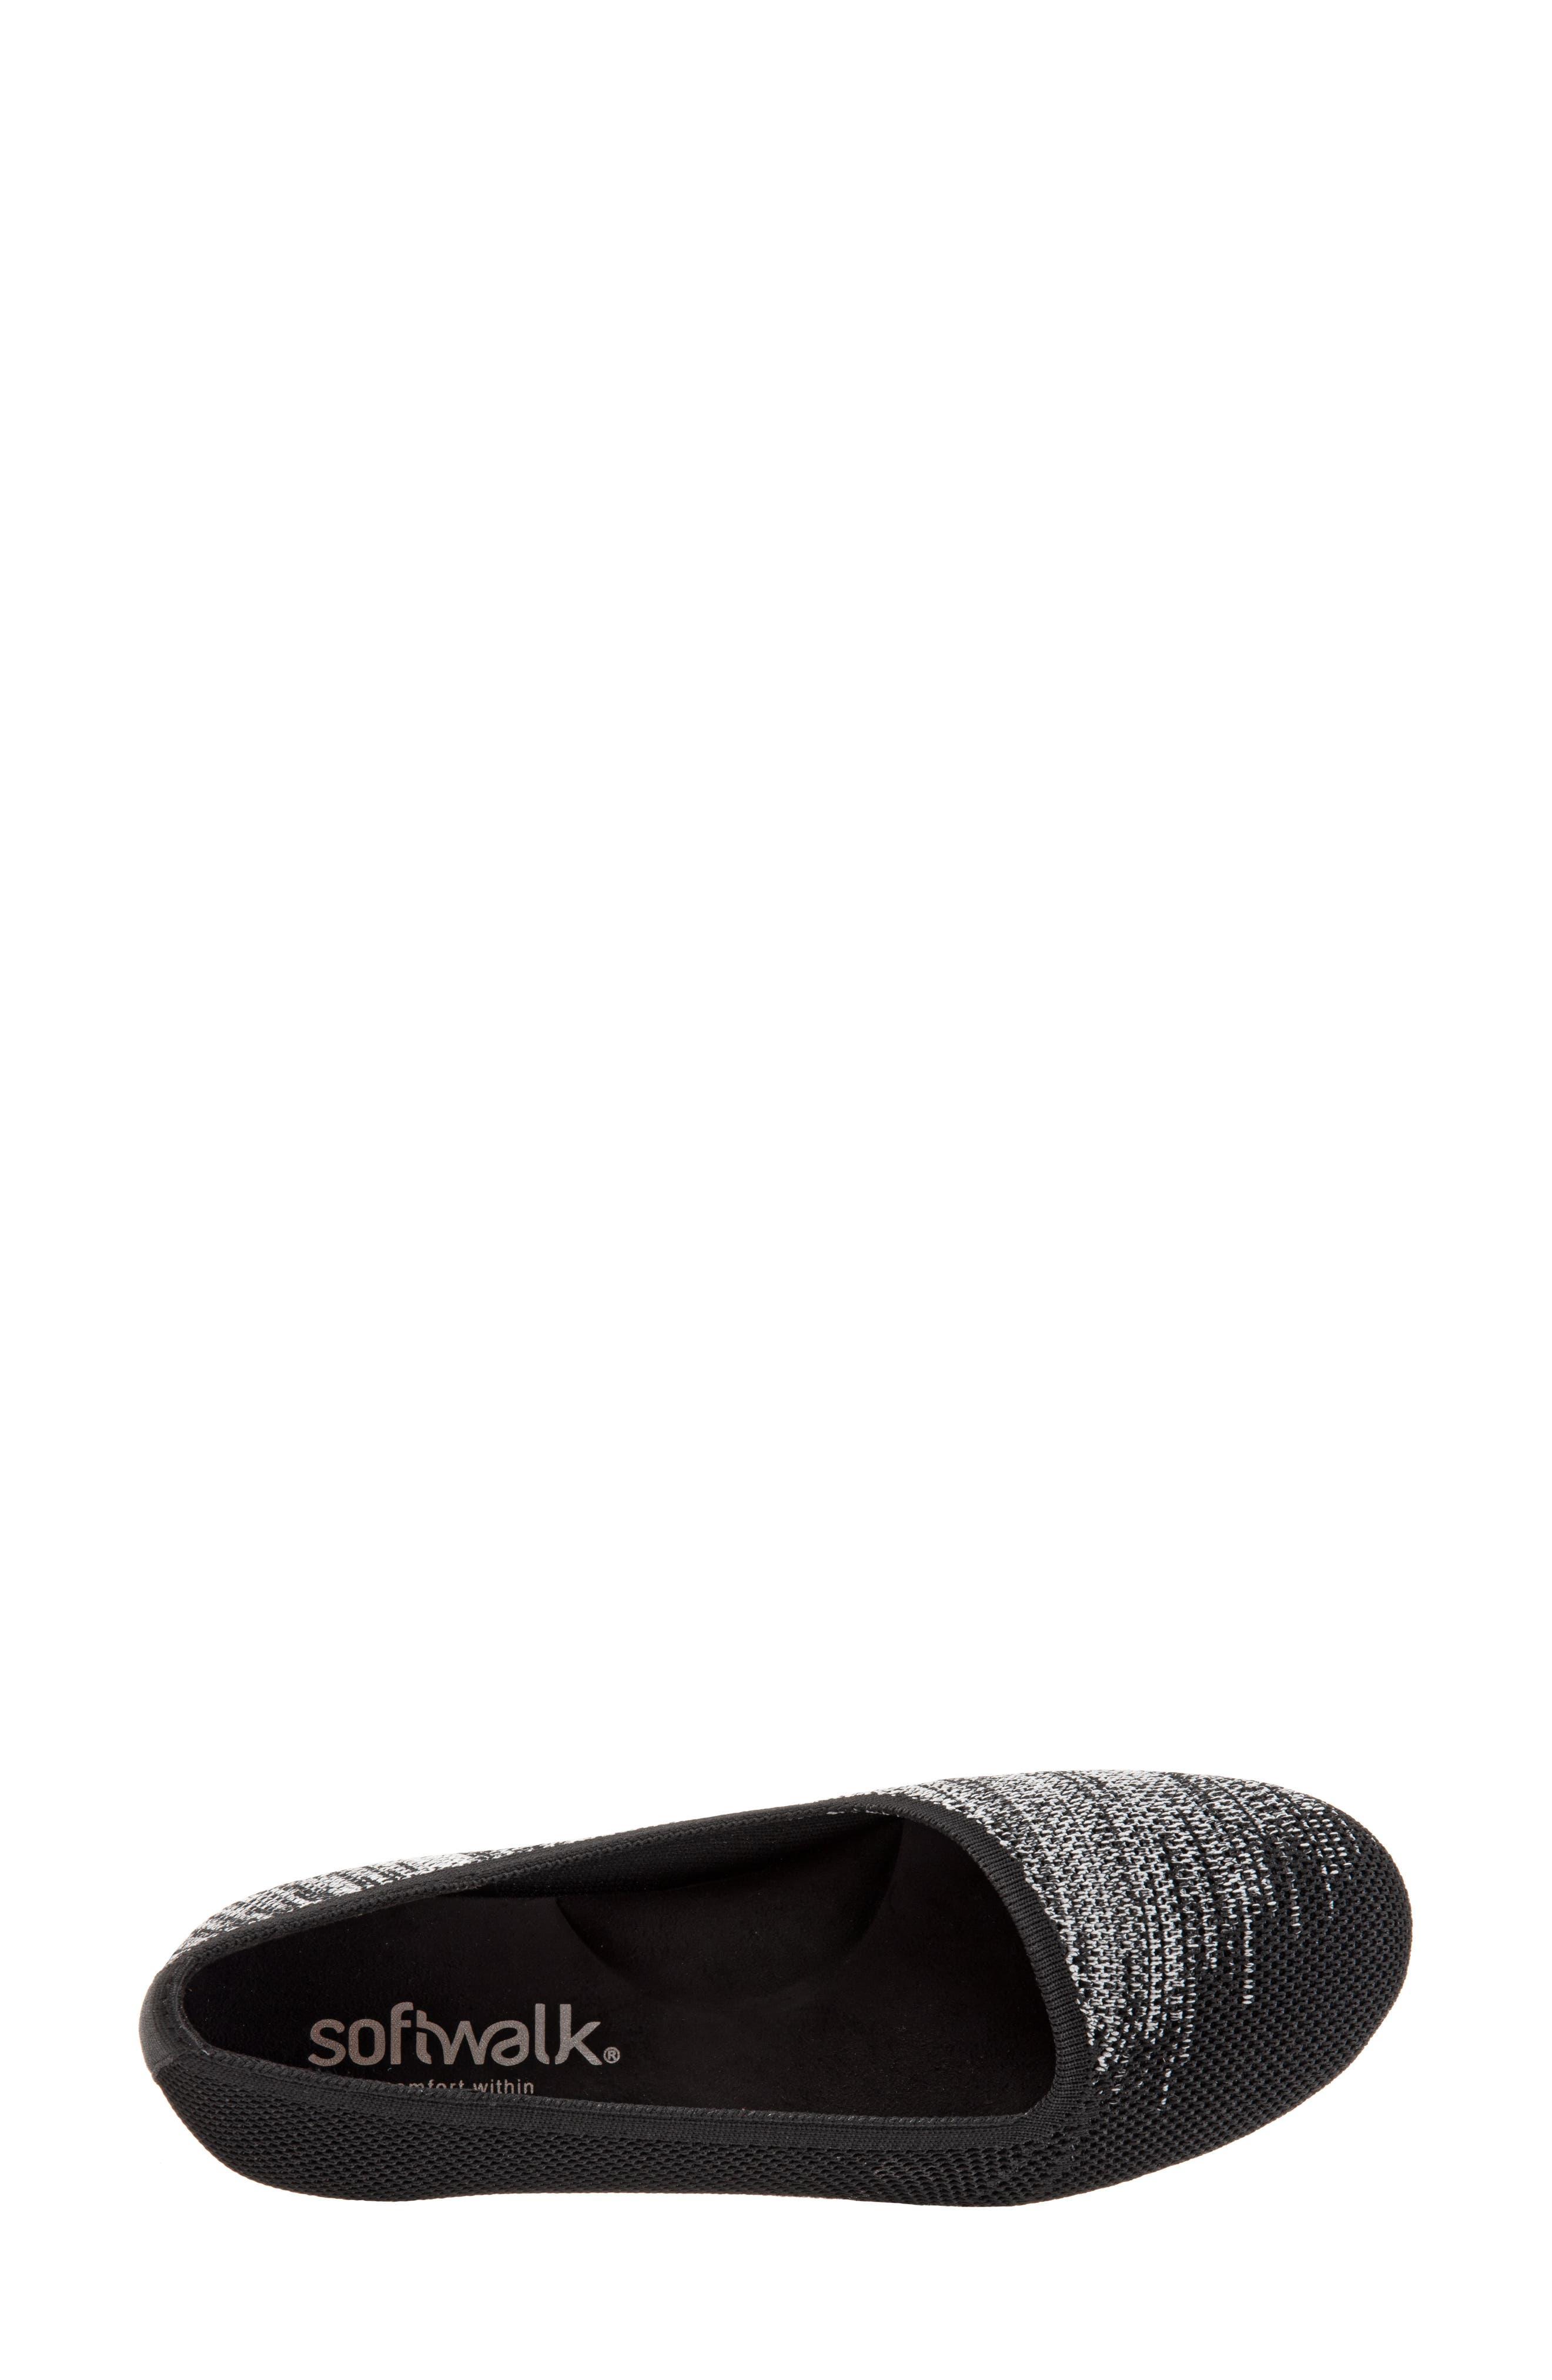 Sicily Knit Flat,                             Alternate thumbnail 5, color,                             BLACK KNIT FABRIC